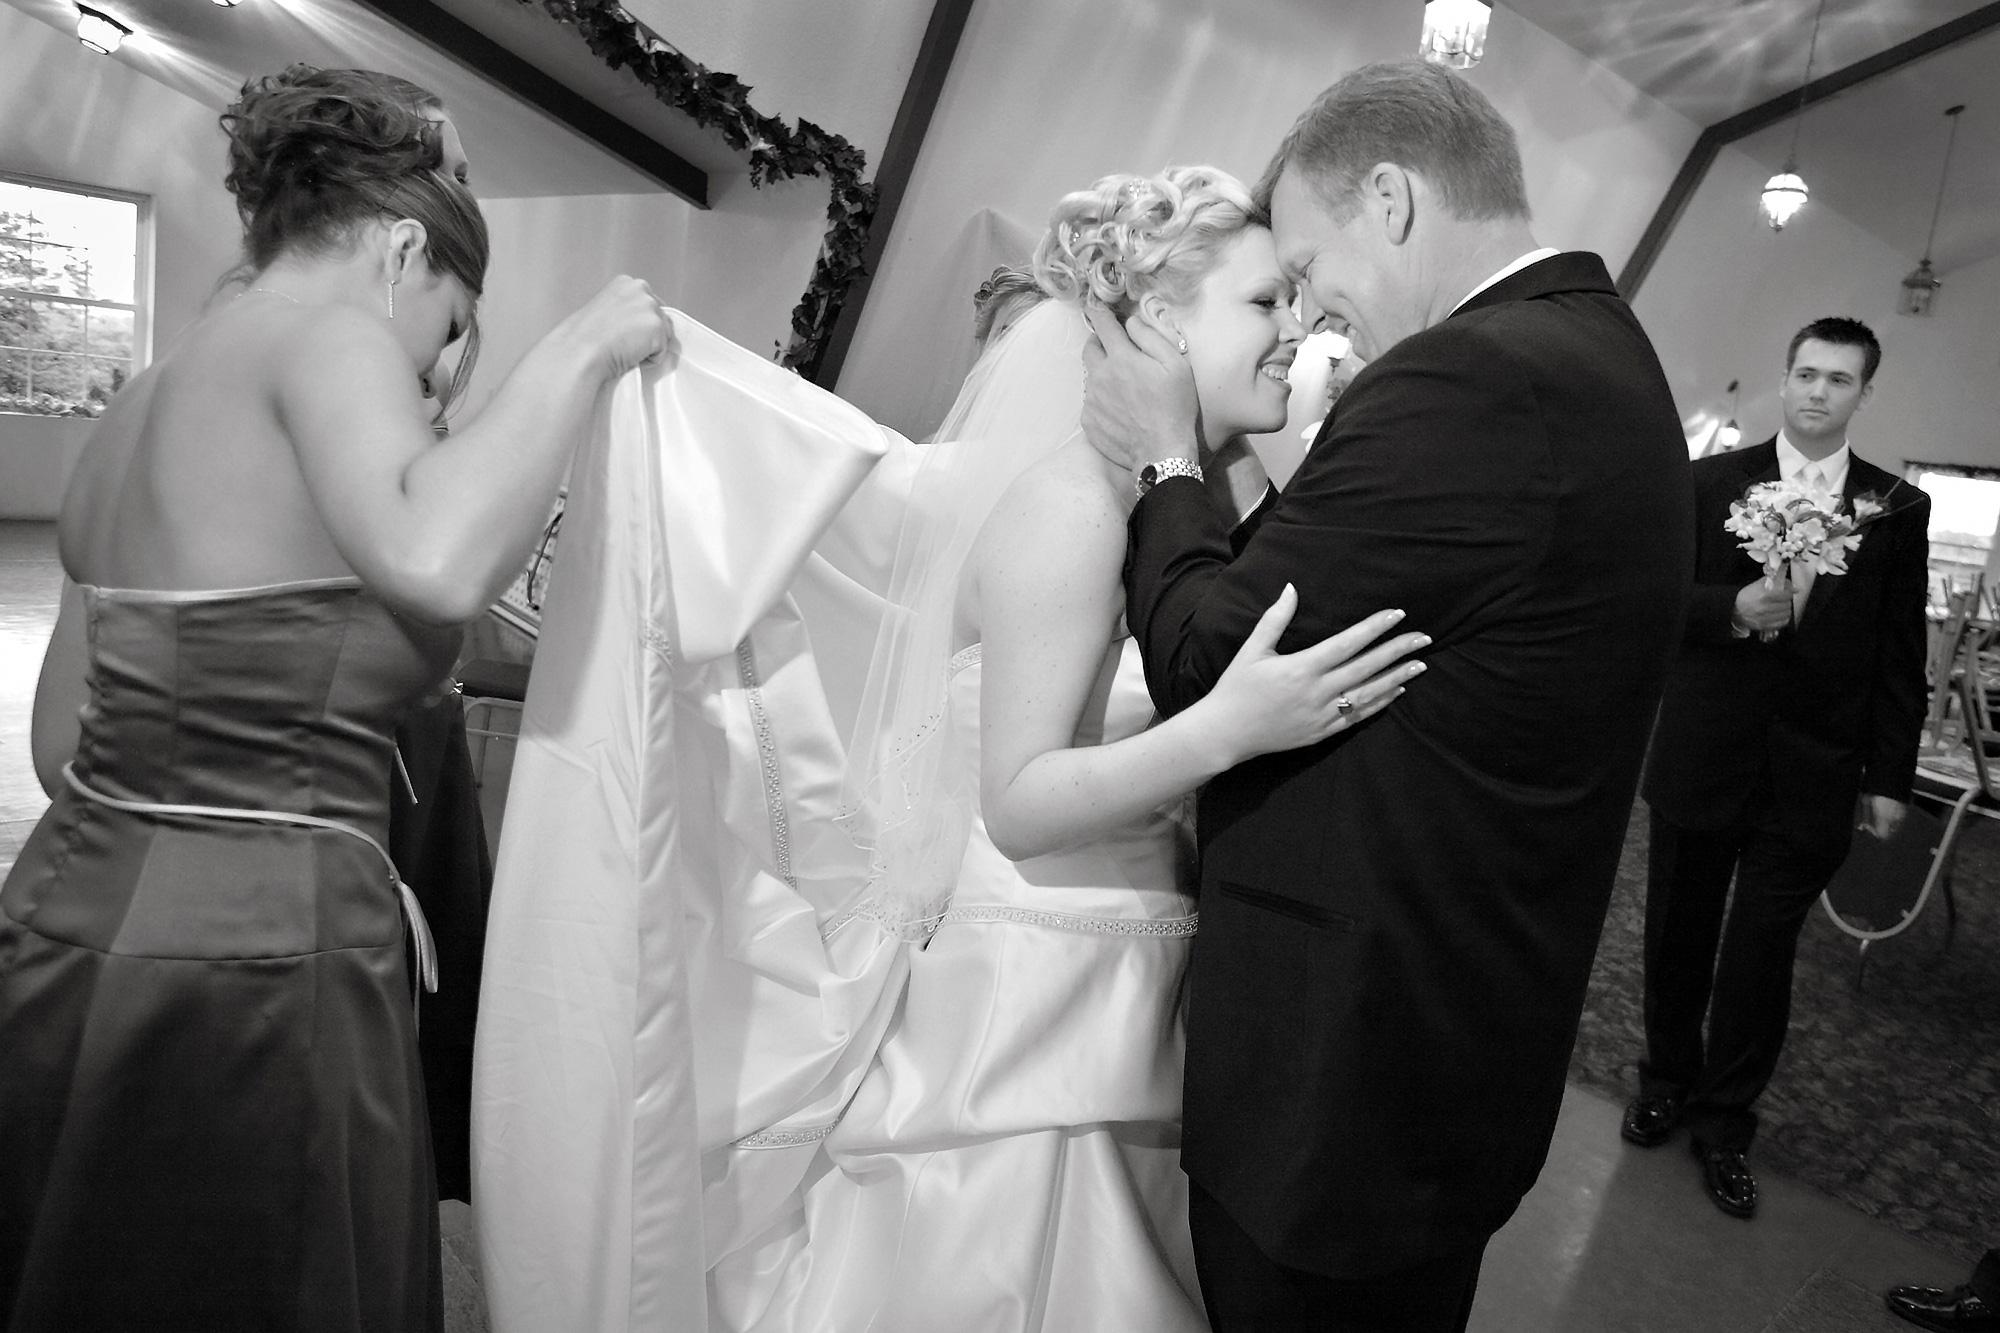 wedding-photography-saint-paul-mark-kegans-662.jpg